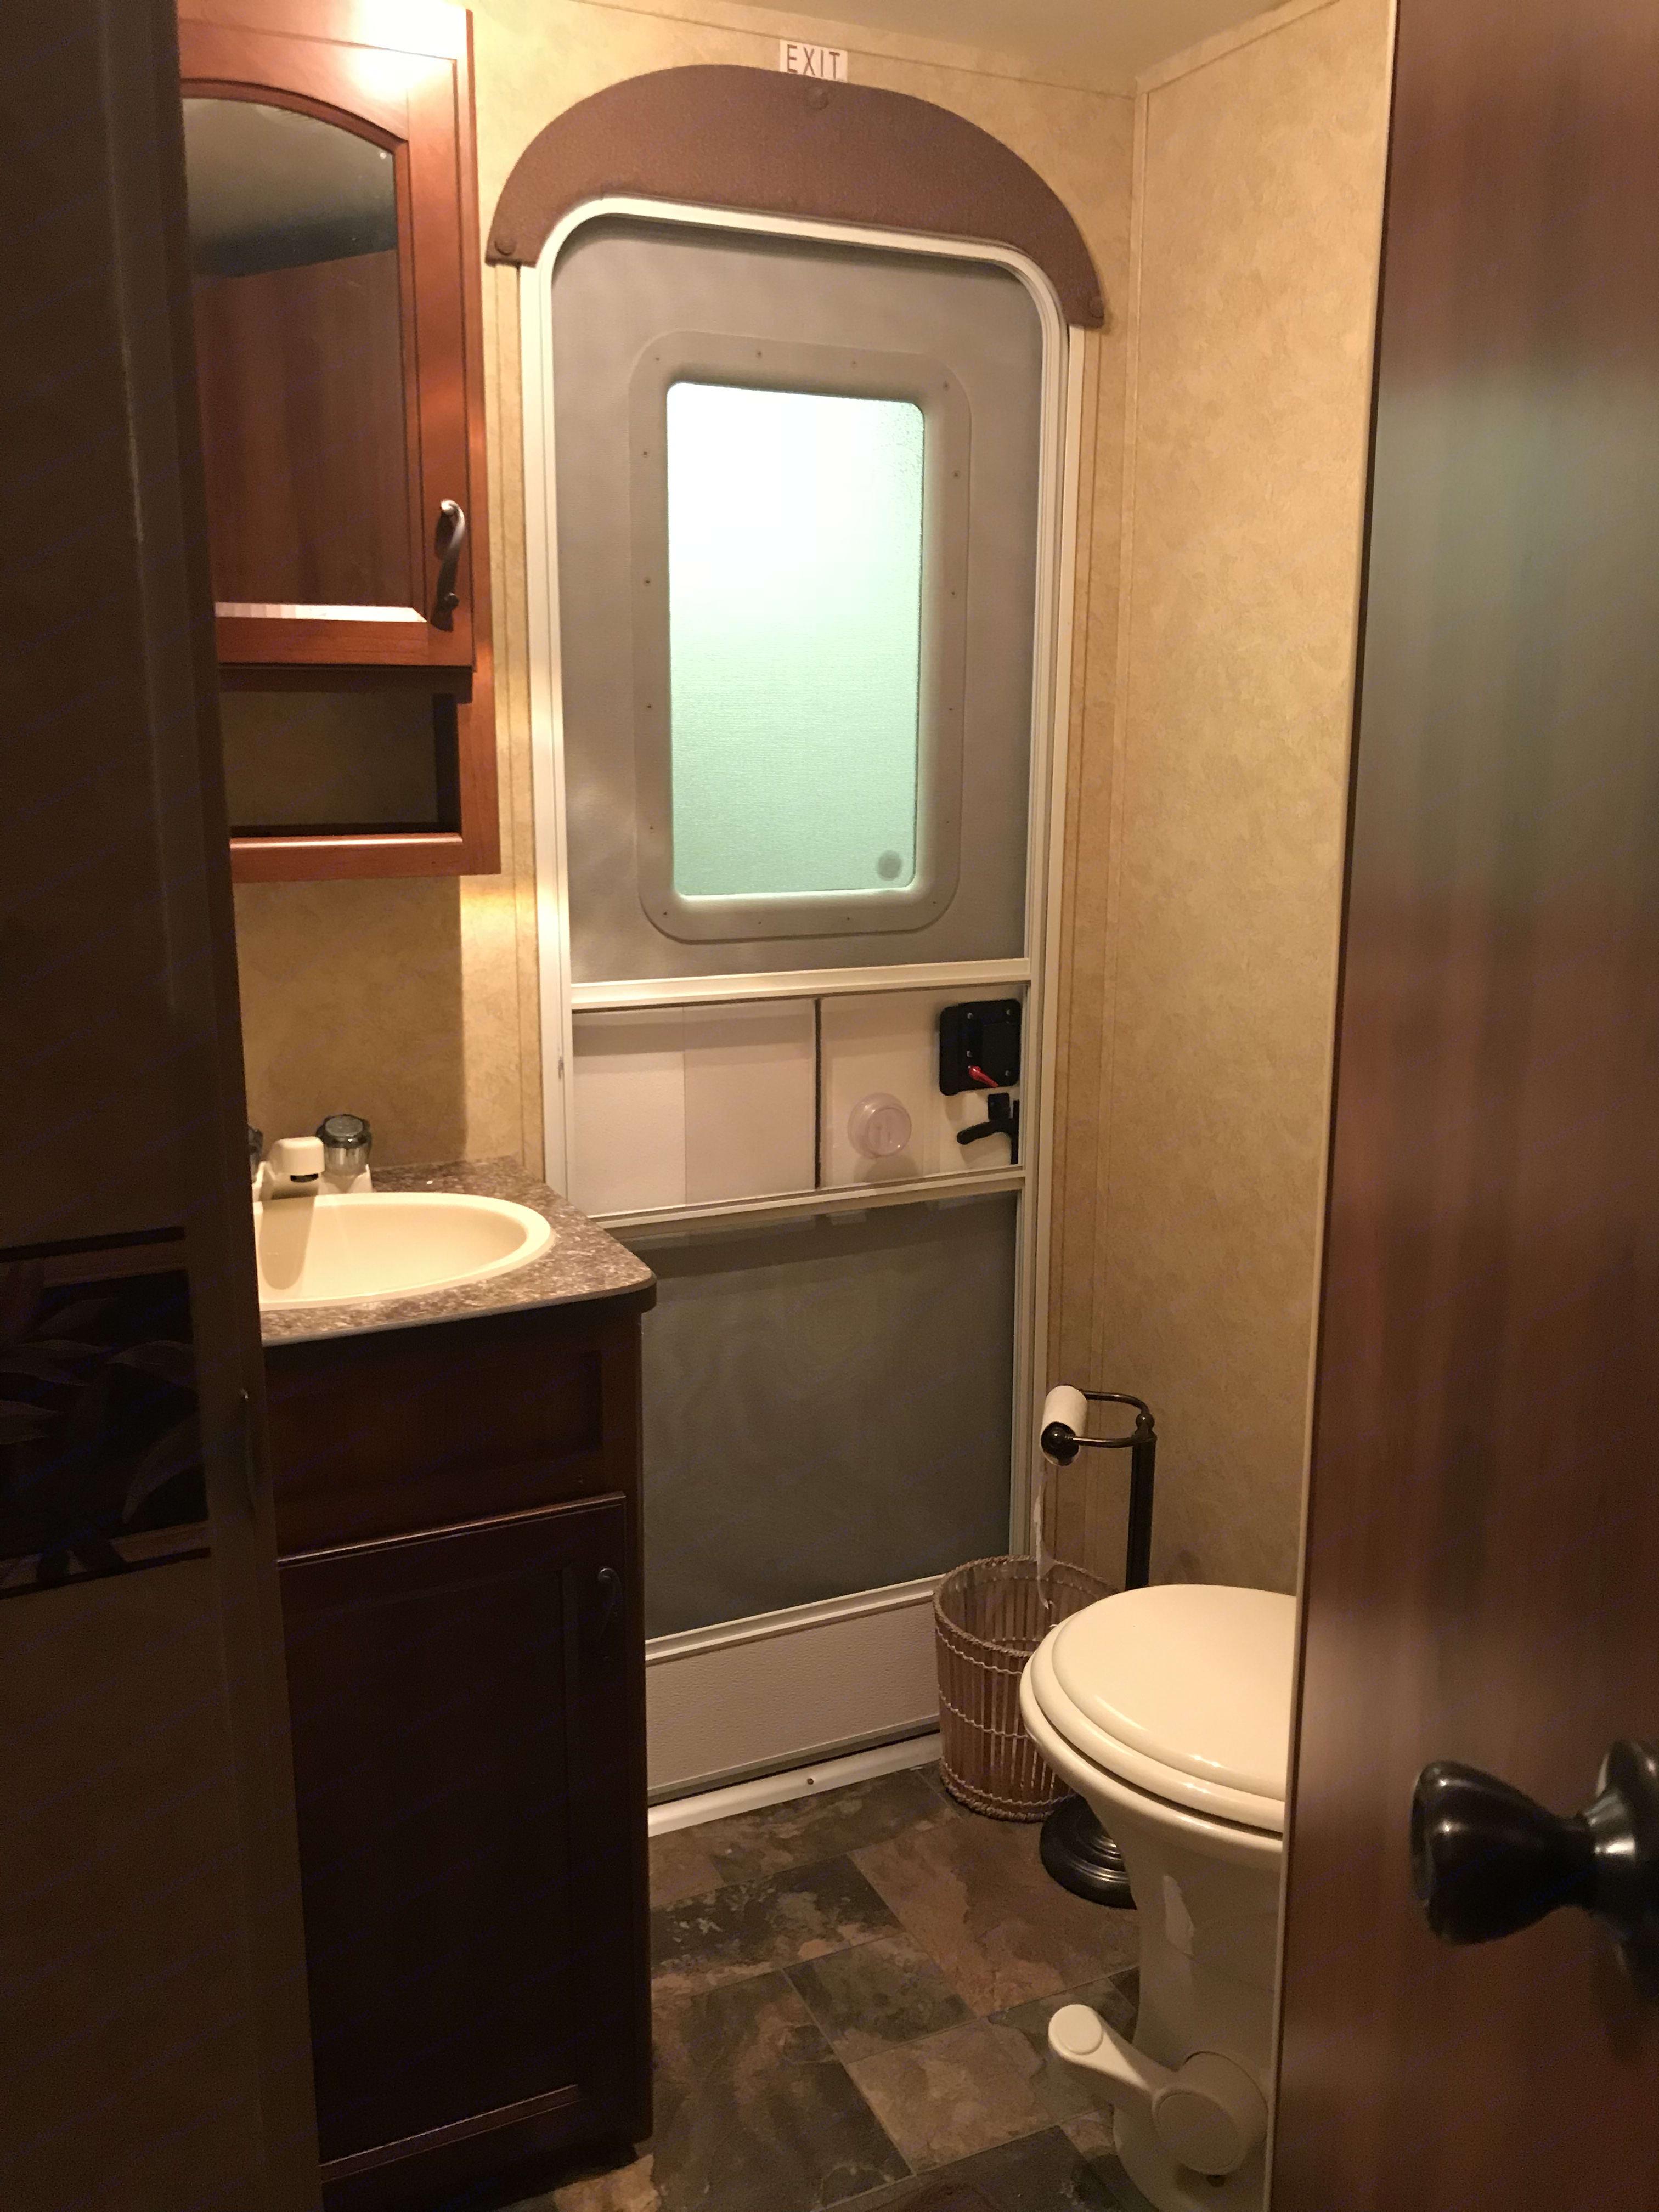 Bathroom . Prime Time Lacrosse 2012